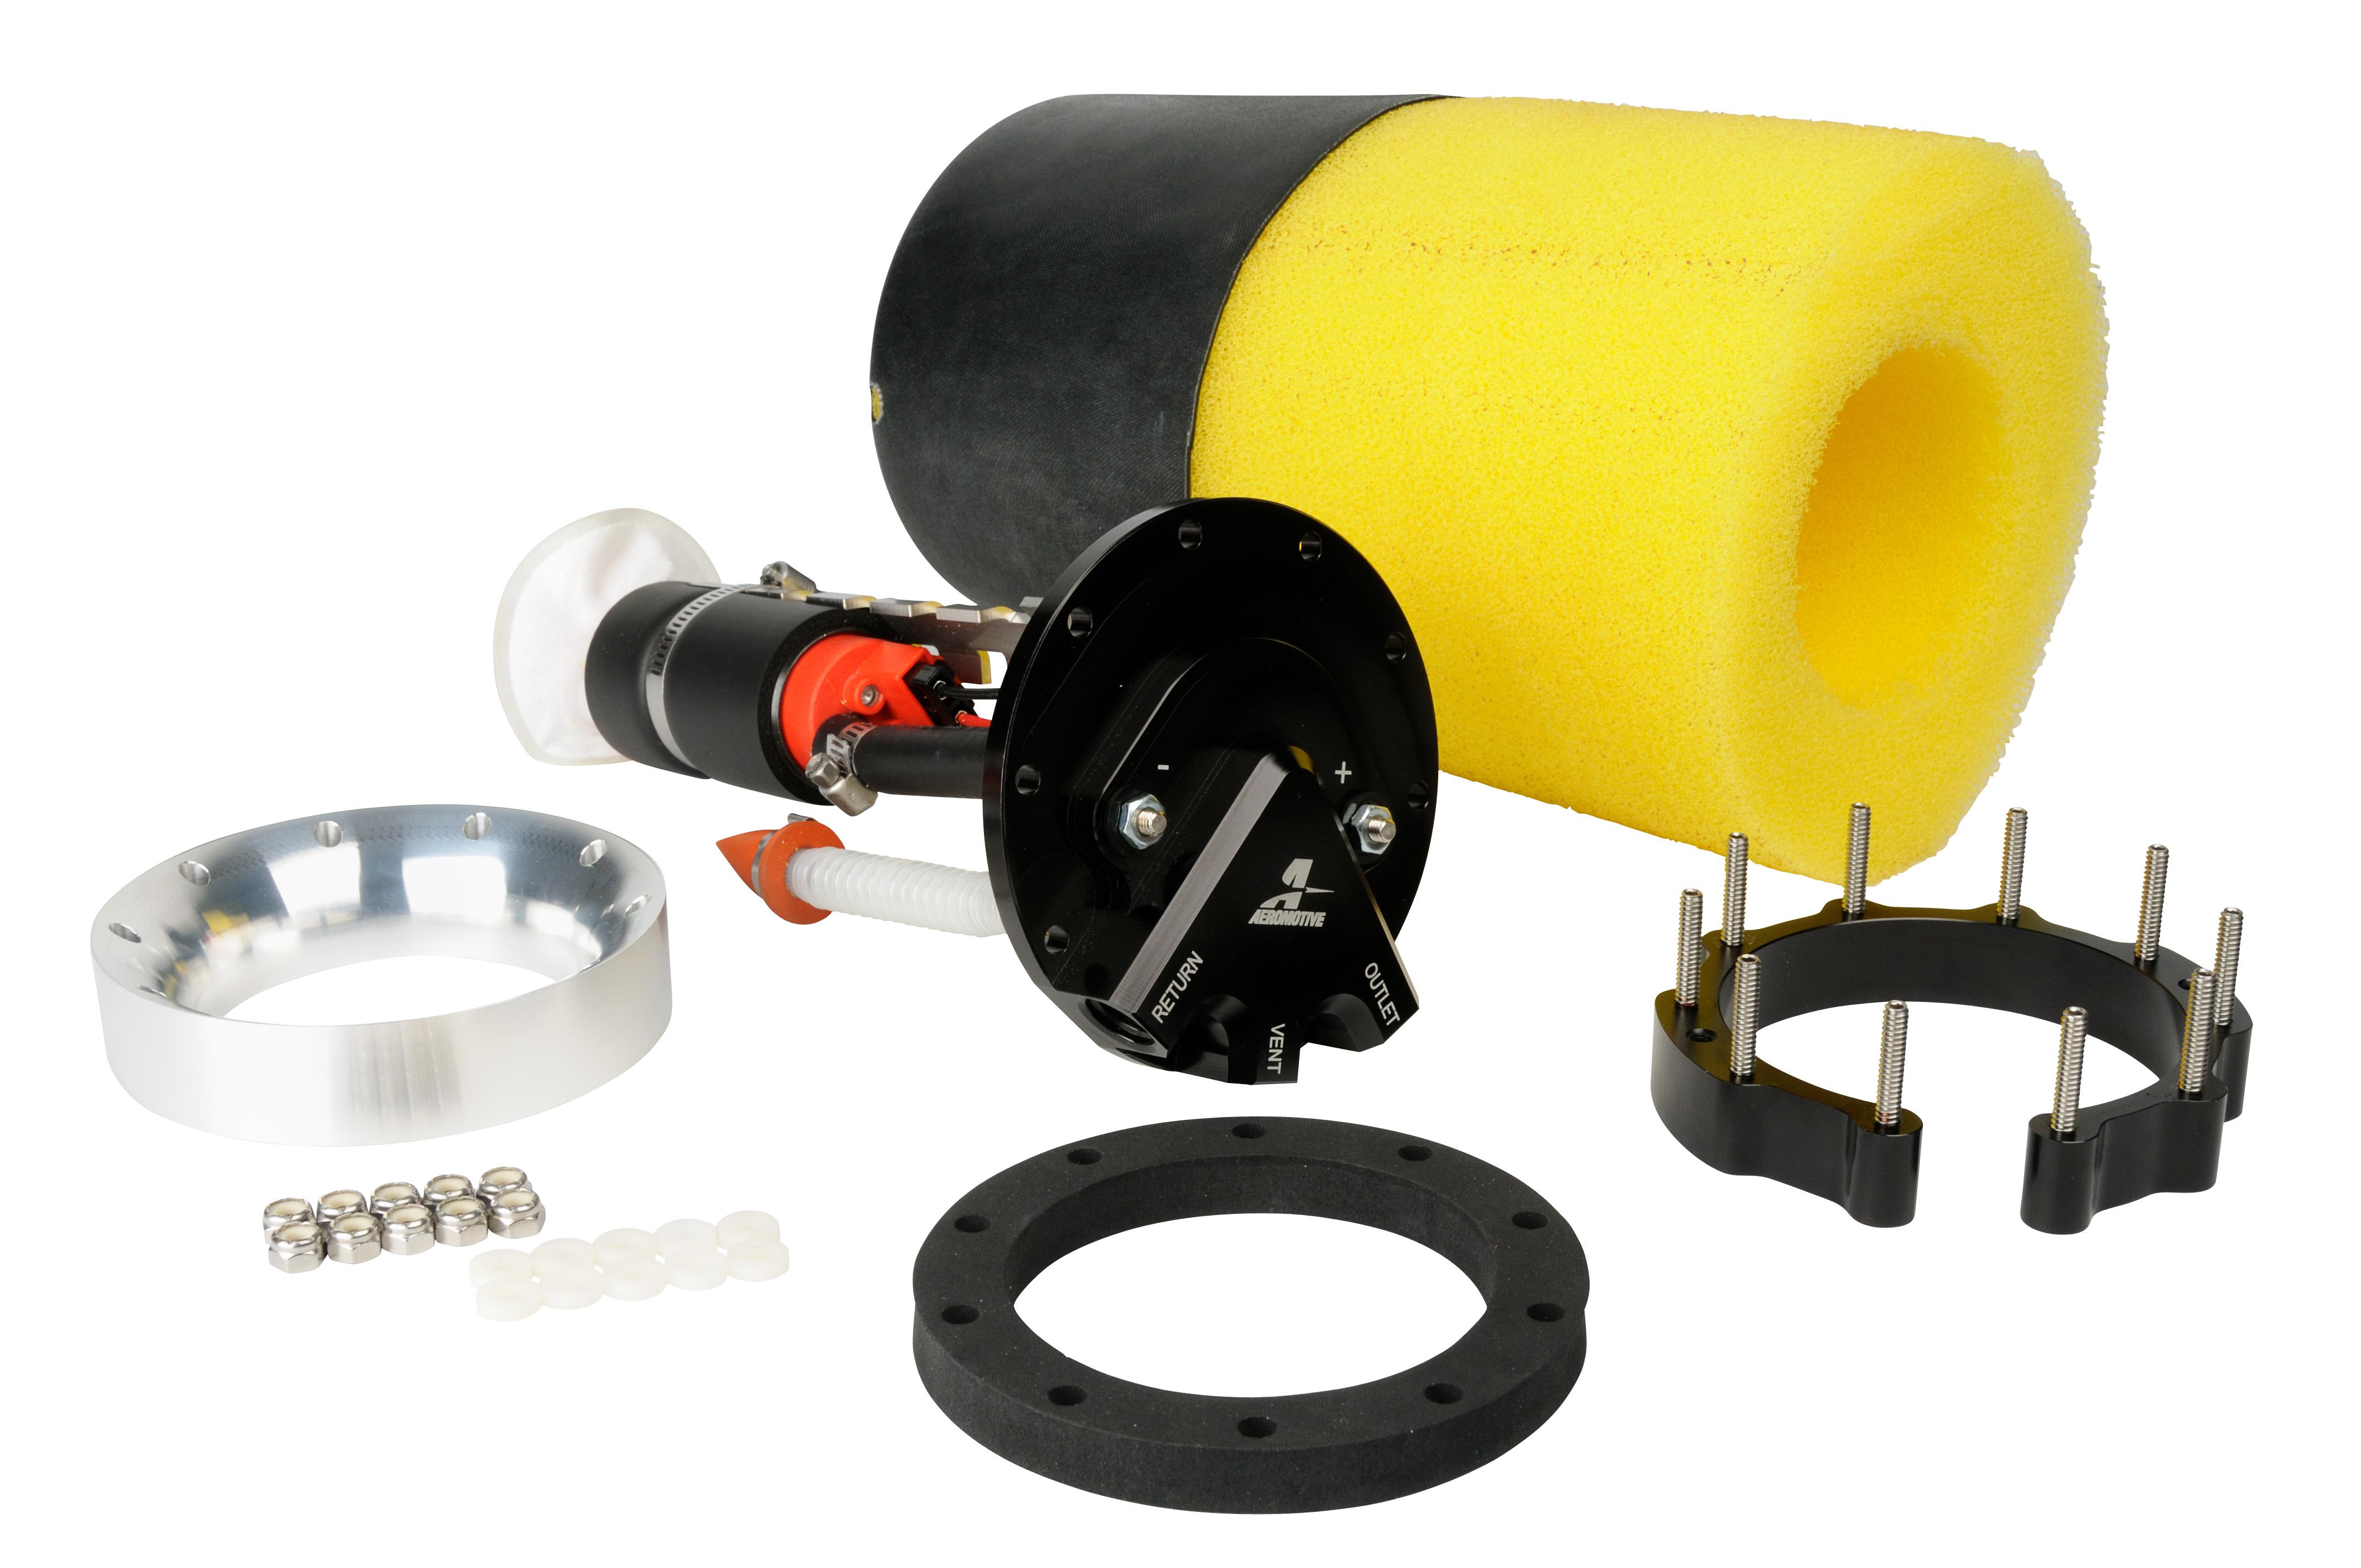 Carbureted Phantom 340 Kit Aeromotive Inc Gas Gauge Fuel Pump Wire Harness